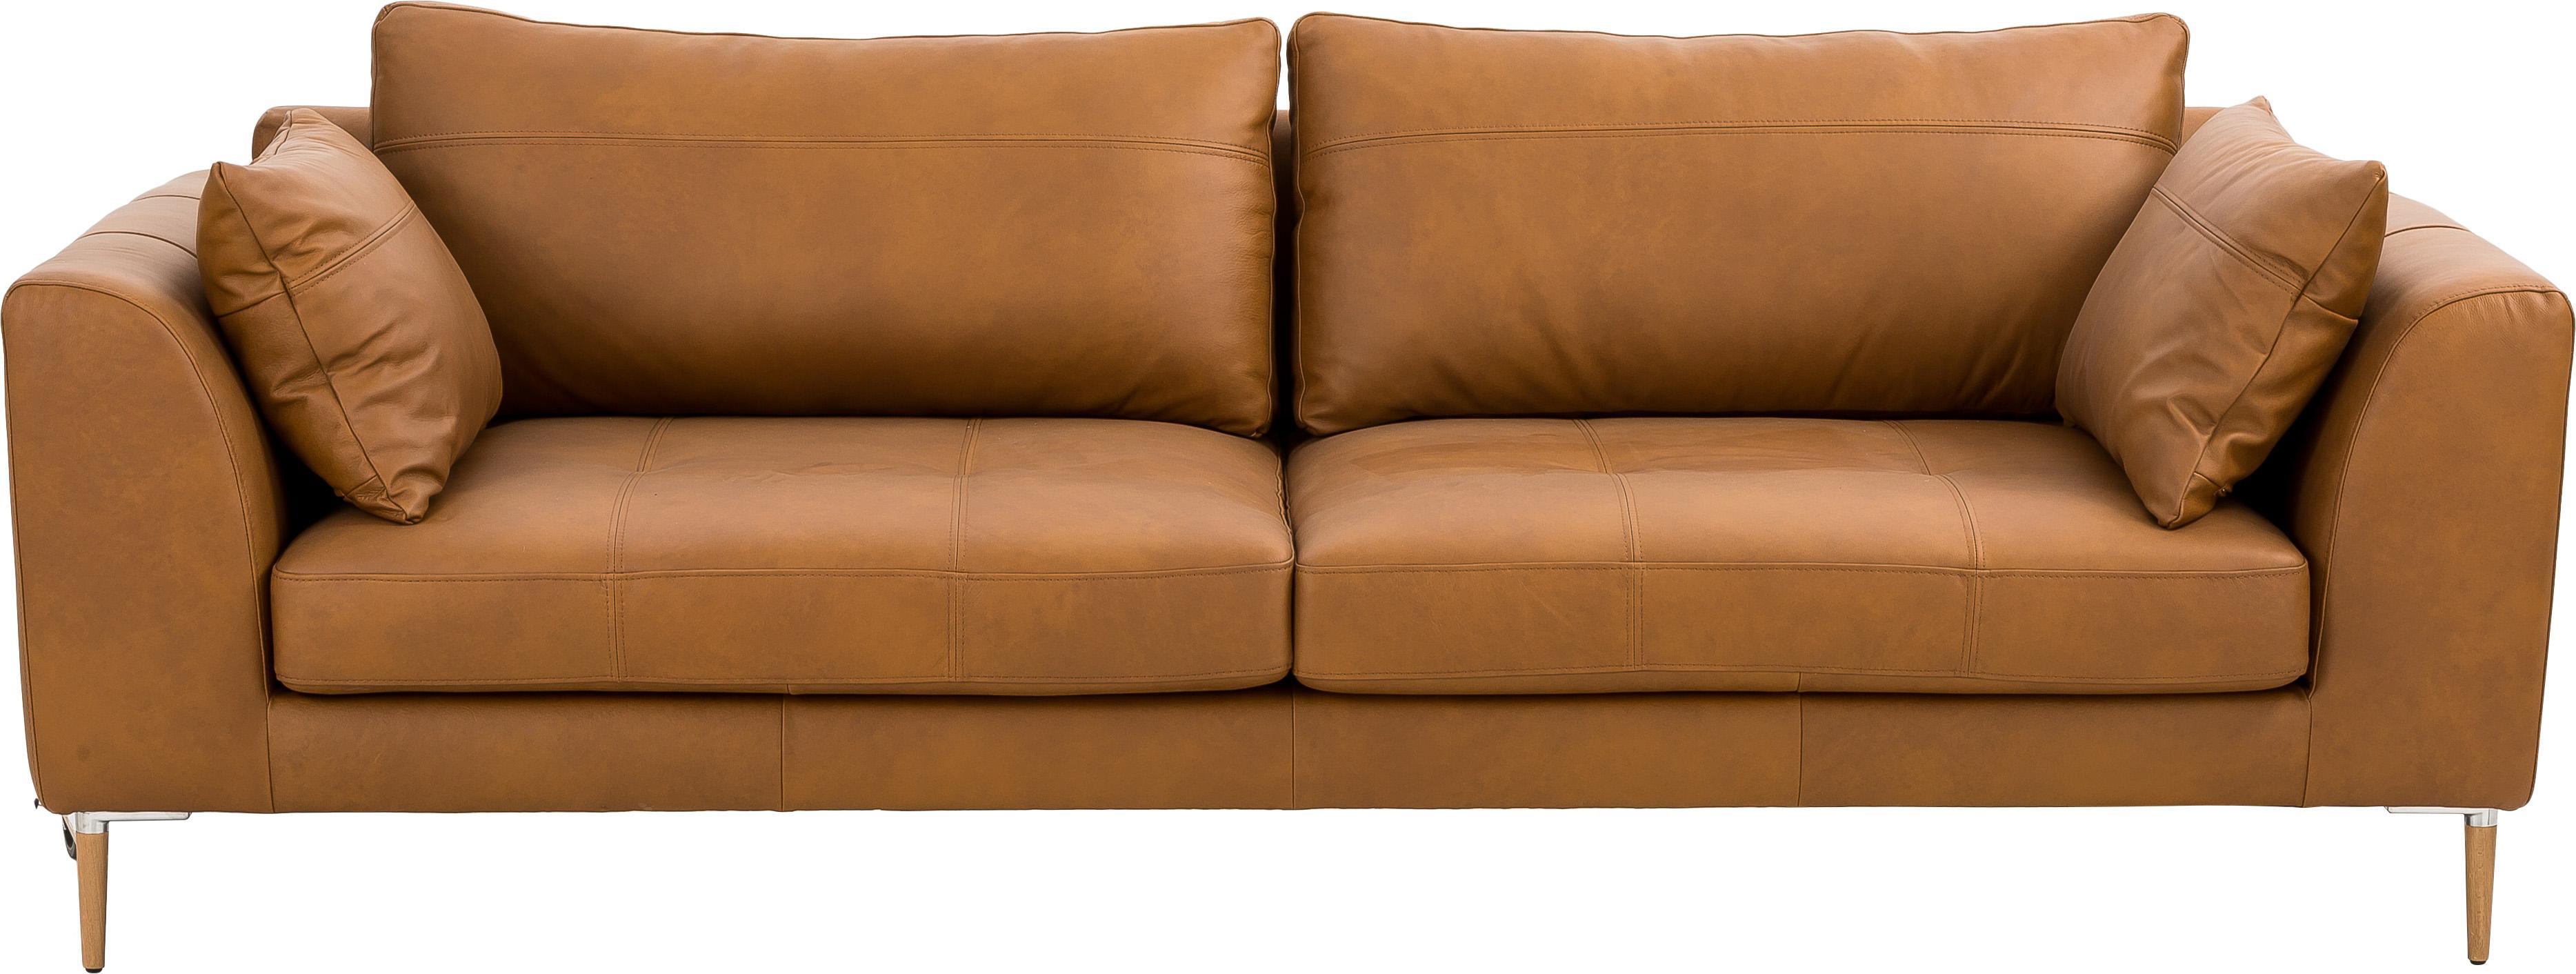 Leder Big Sofa Canyon (3-Sitzer), Bezug: Semianilinleder, Leder Cognac, B 225 x T 100 cm